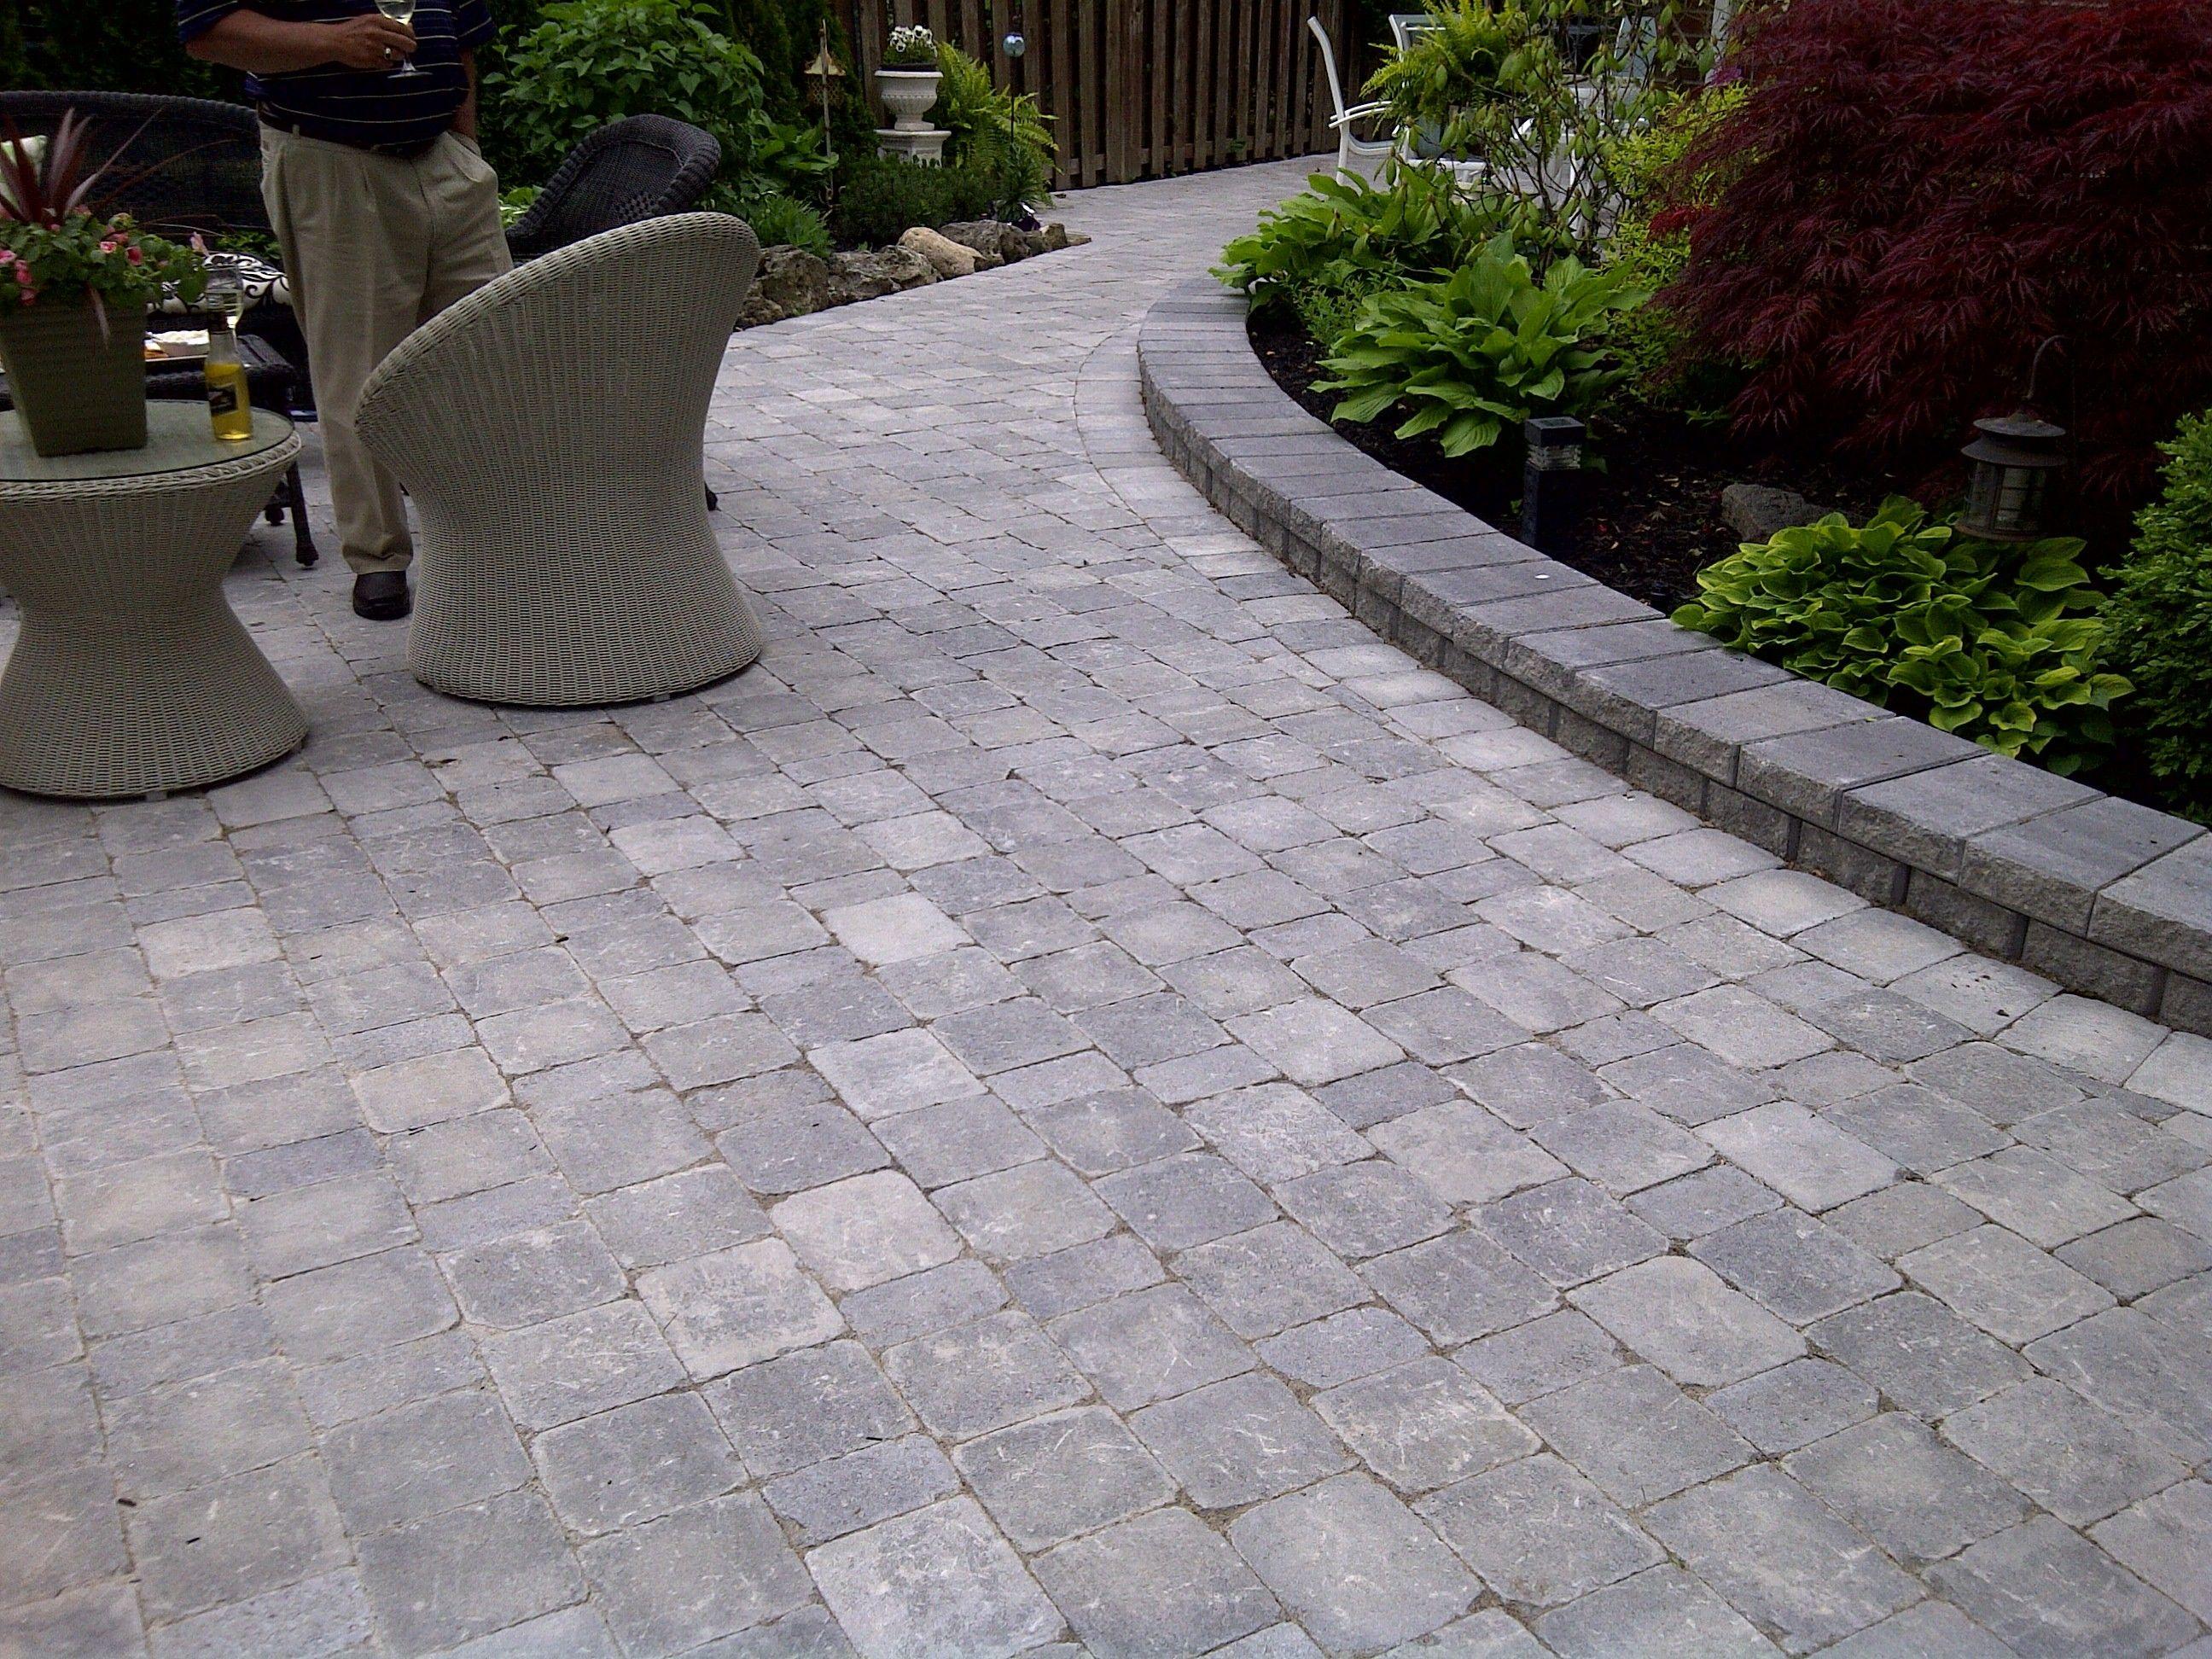 Interlocking stone patio using Brussels block Unilock